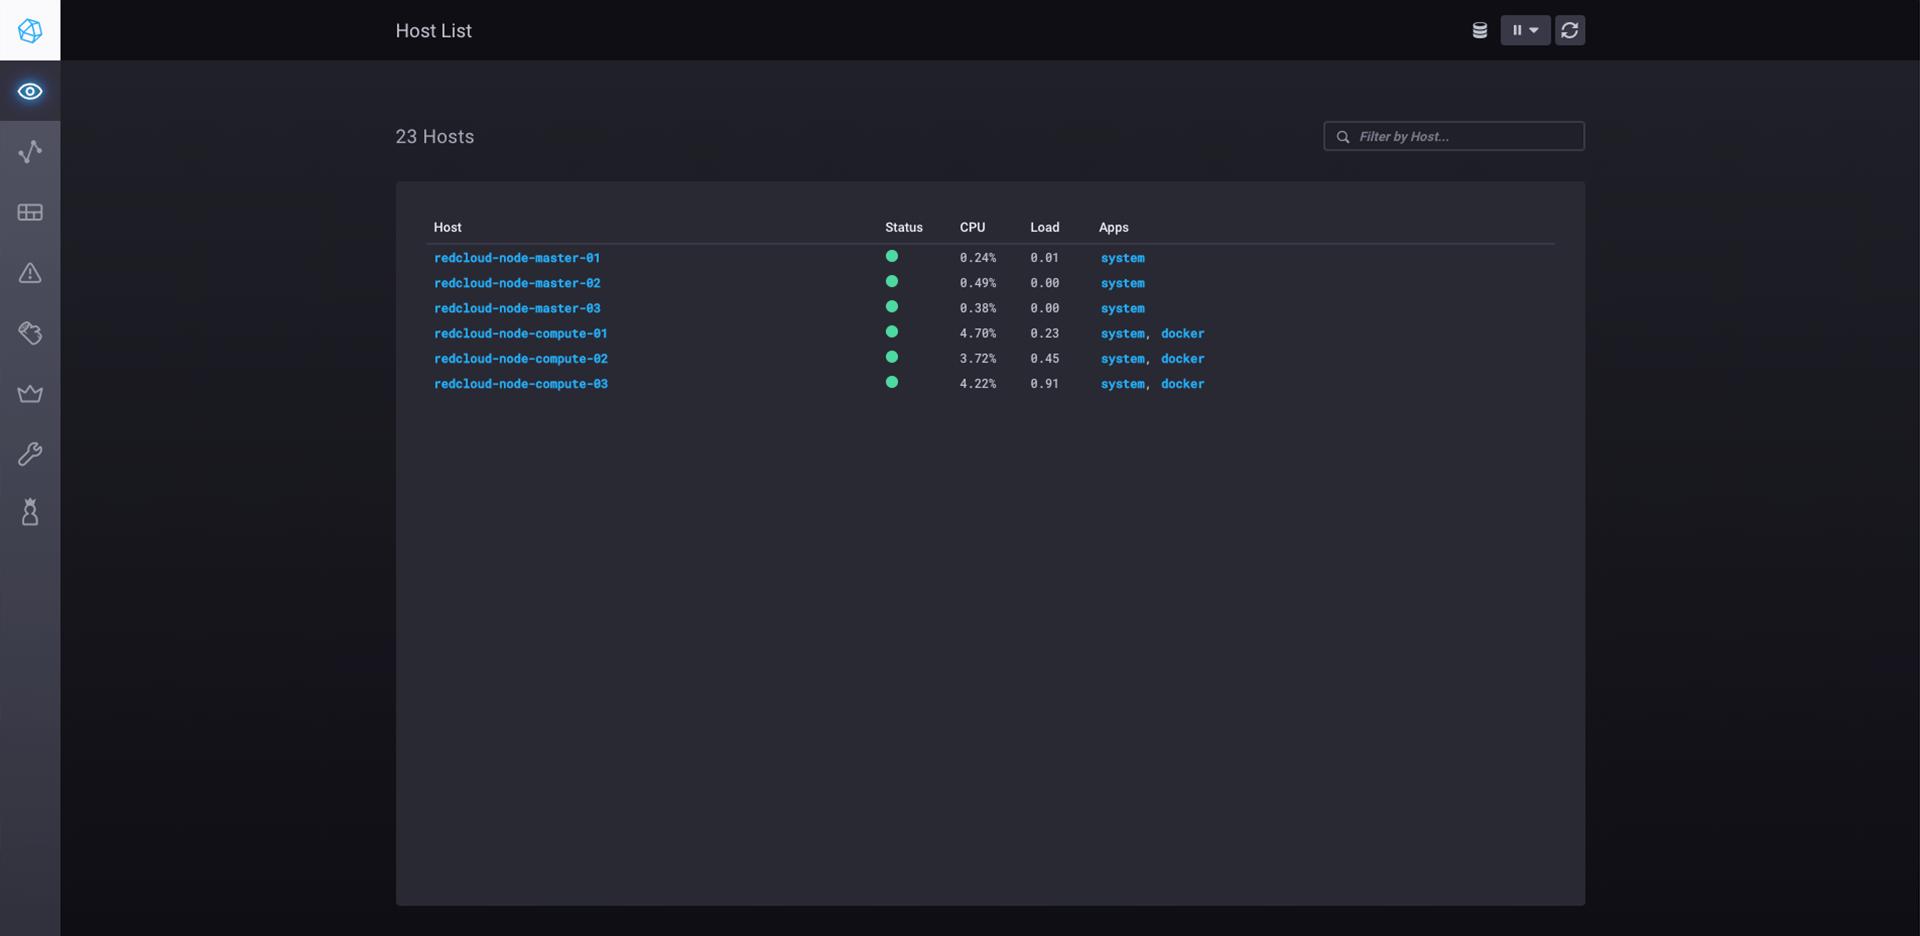 Influxdb Network Availability